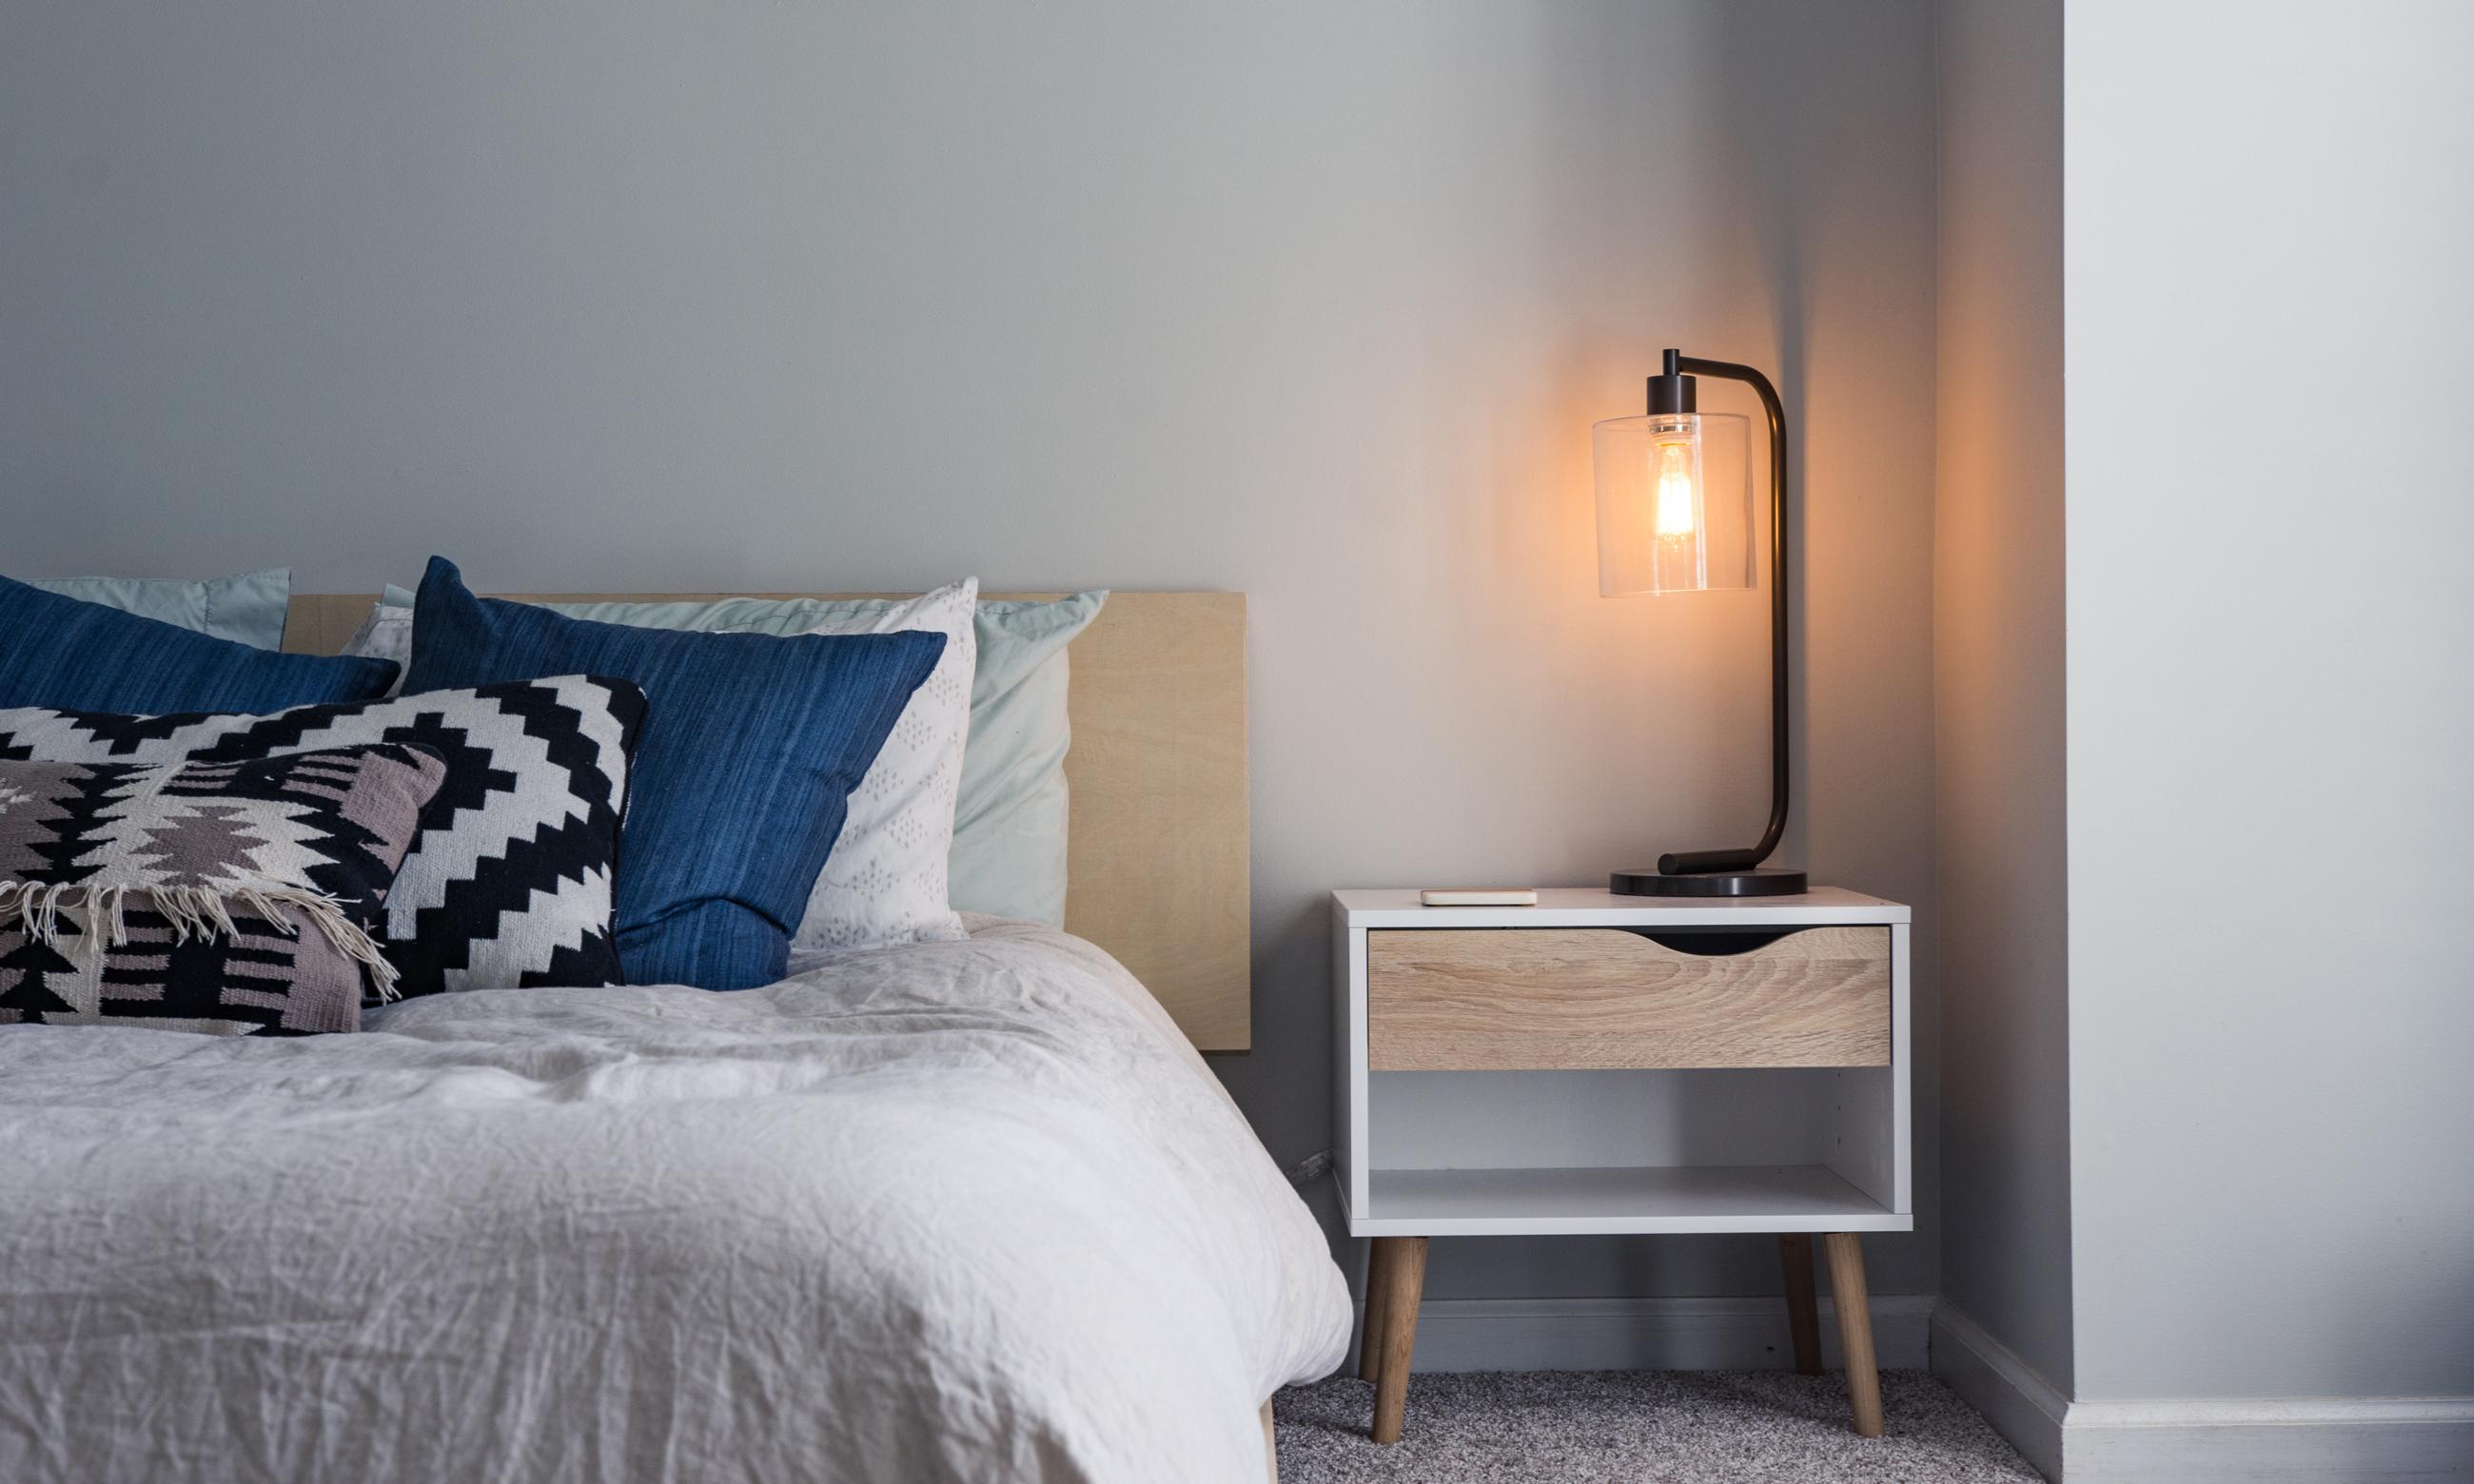 Minimalist Bedroom How To Minimize Your Bedroom,Sketch Architecture Art Design